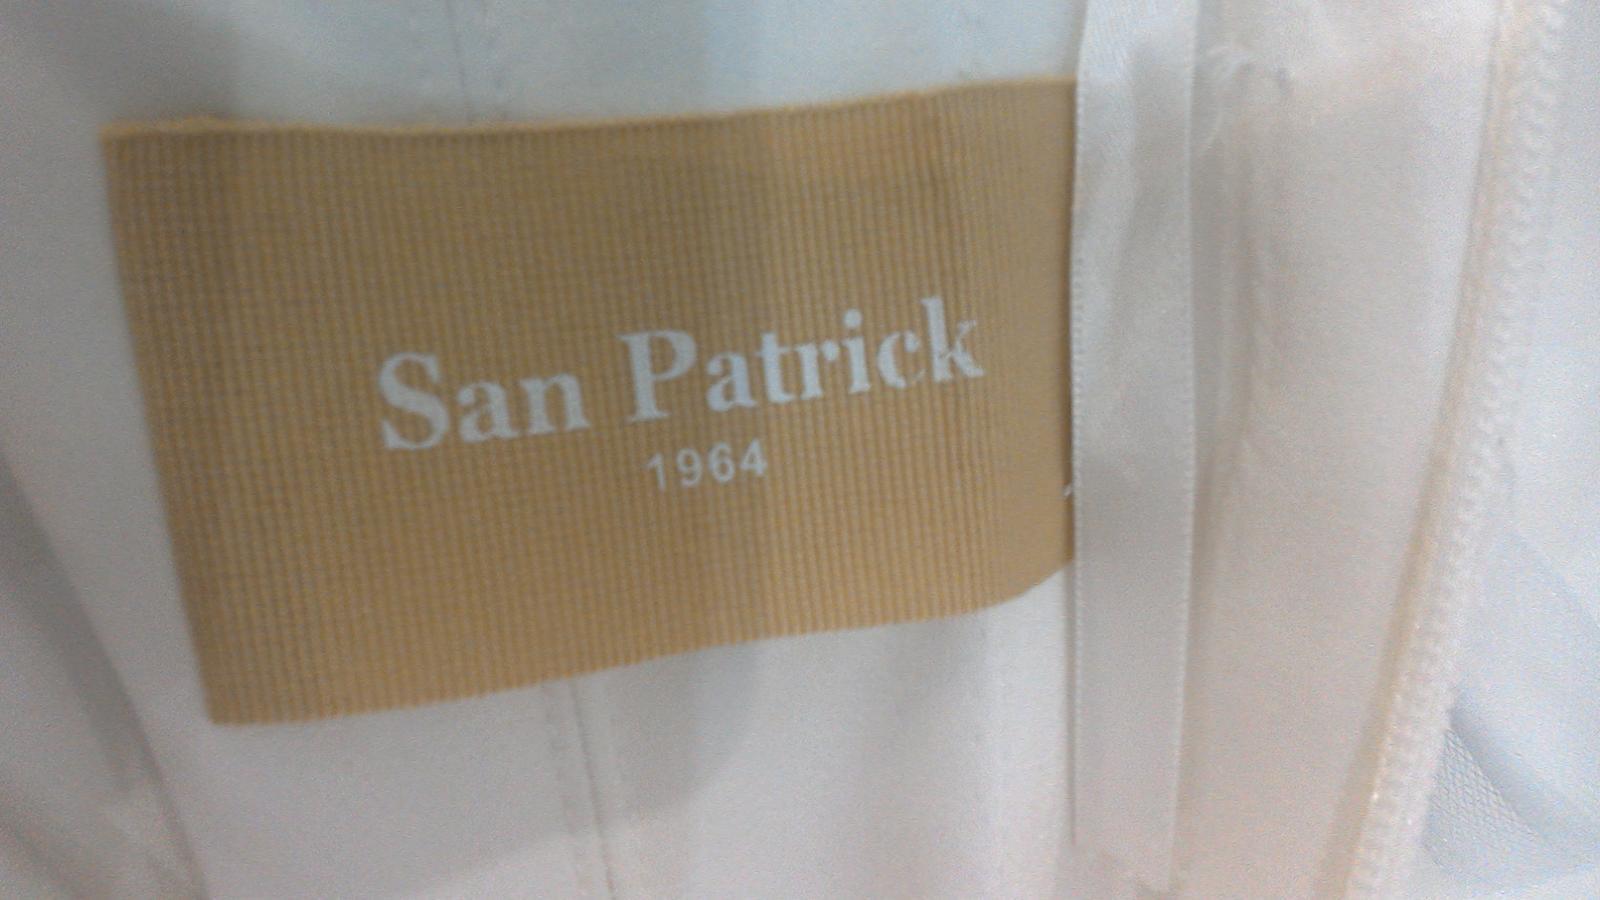 San Patrick- Hannaly - Obrázek č. 4